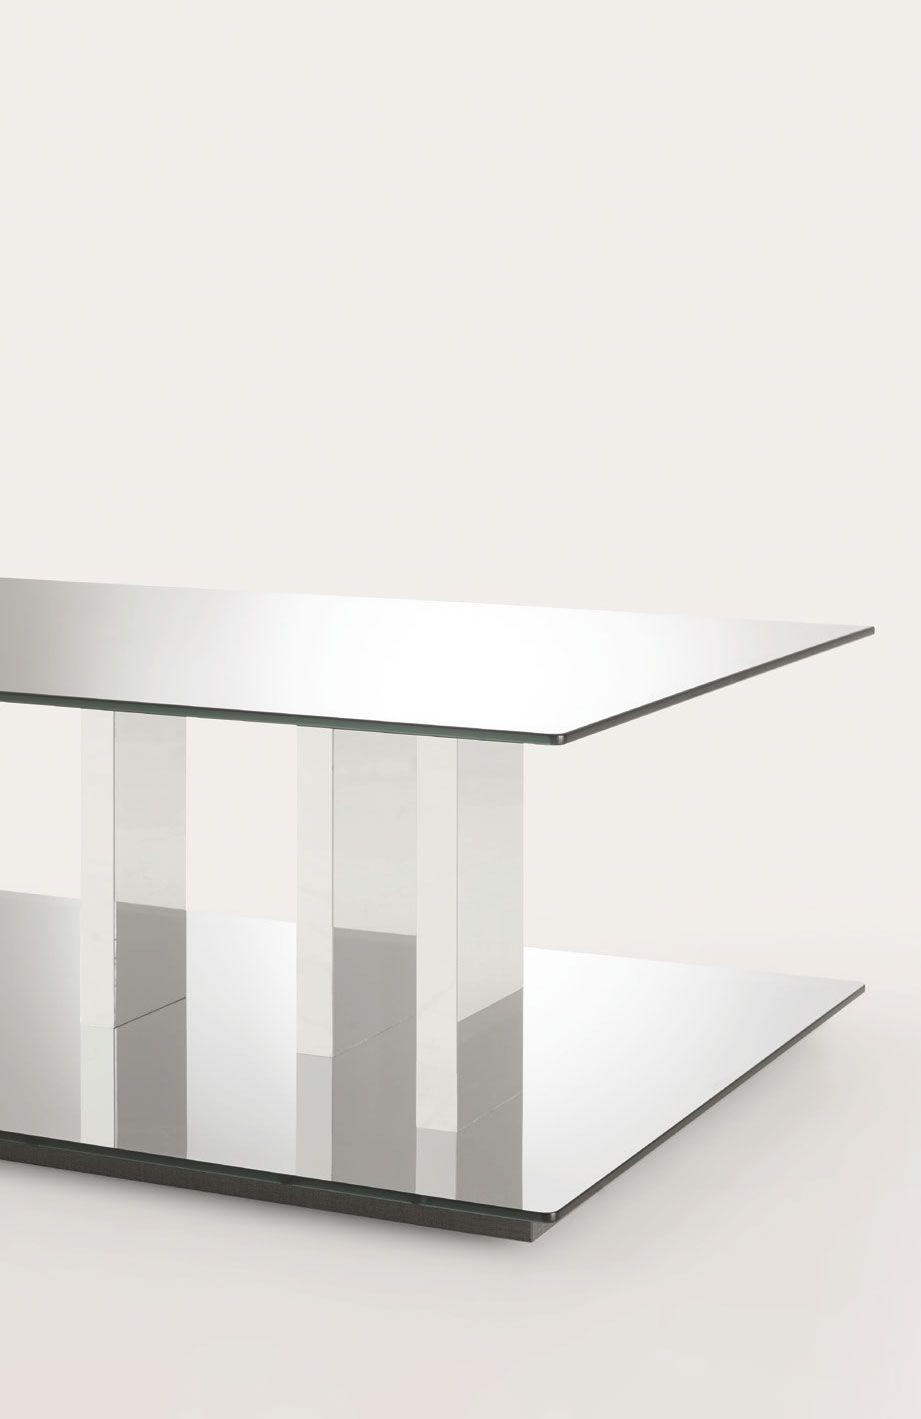 alleluia coffee table designed by marie christine dorner for ligne rh pinterest com